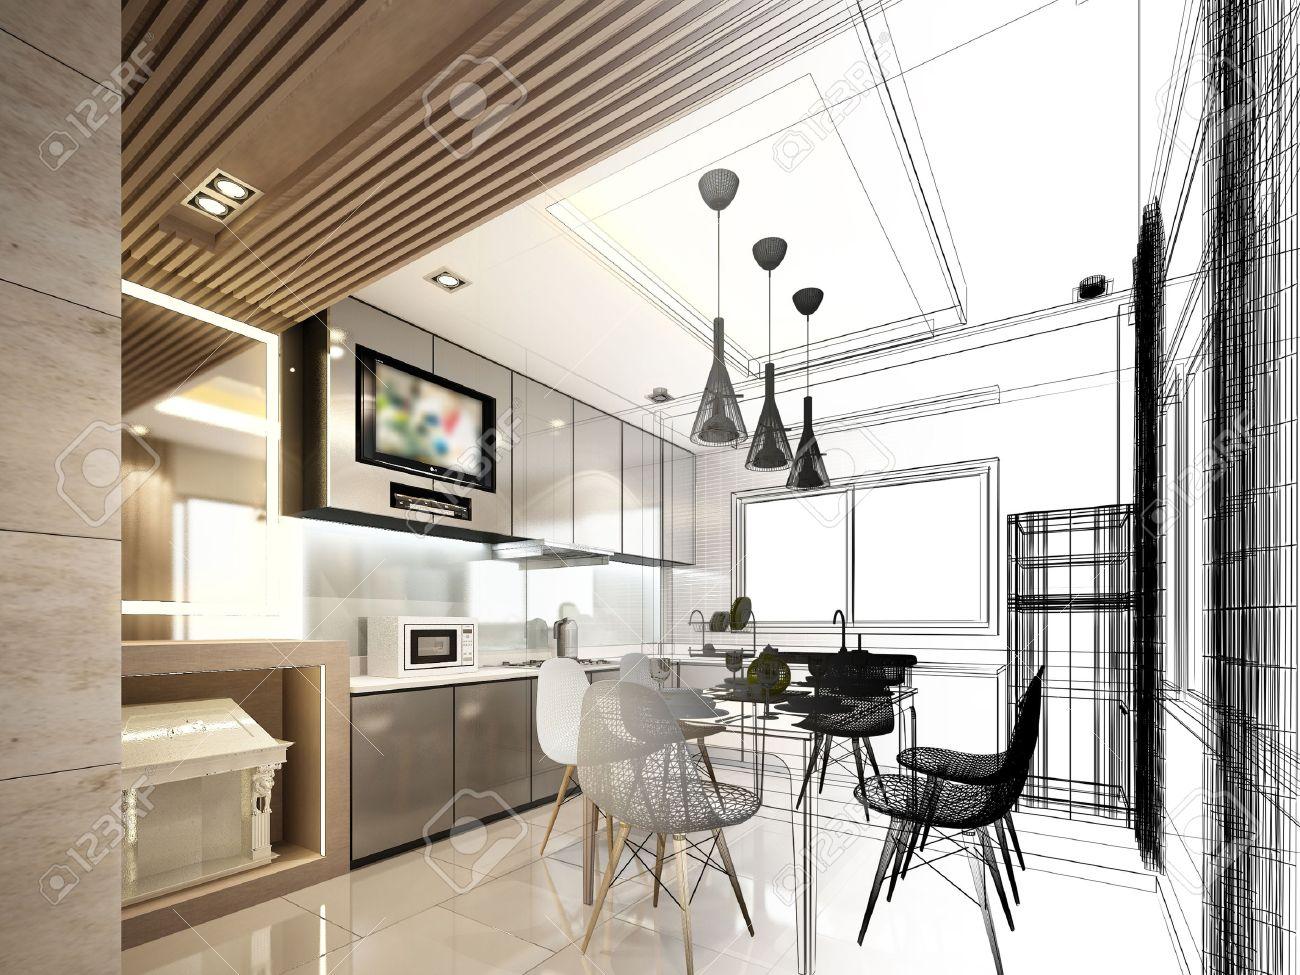 abstract sketch design of interior kitchen Archivio Fotografico - 40904819